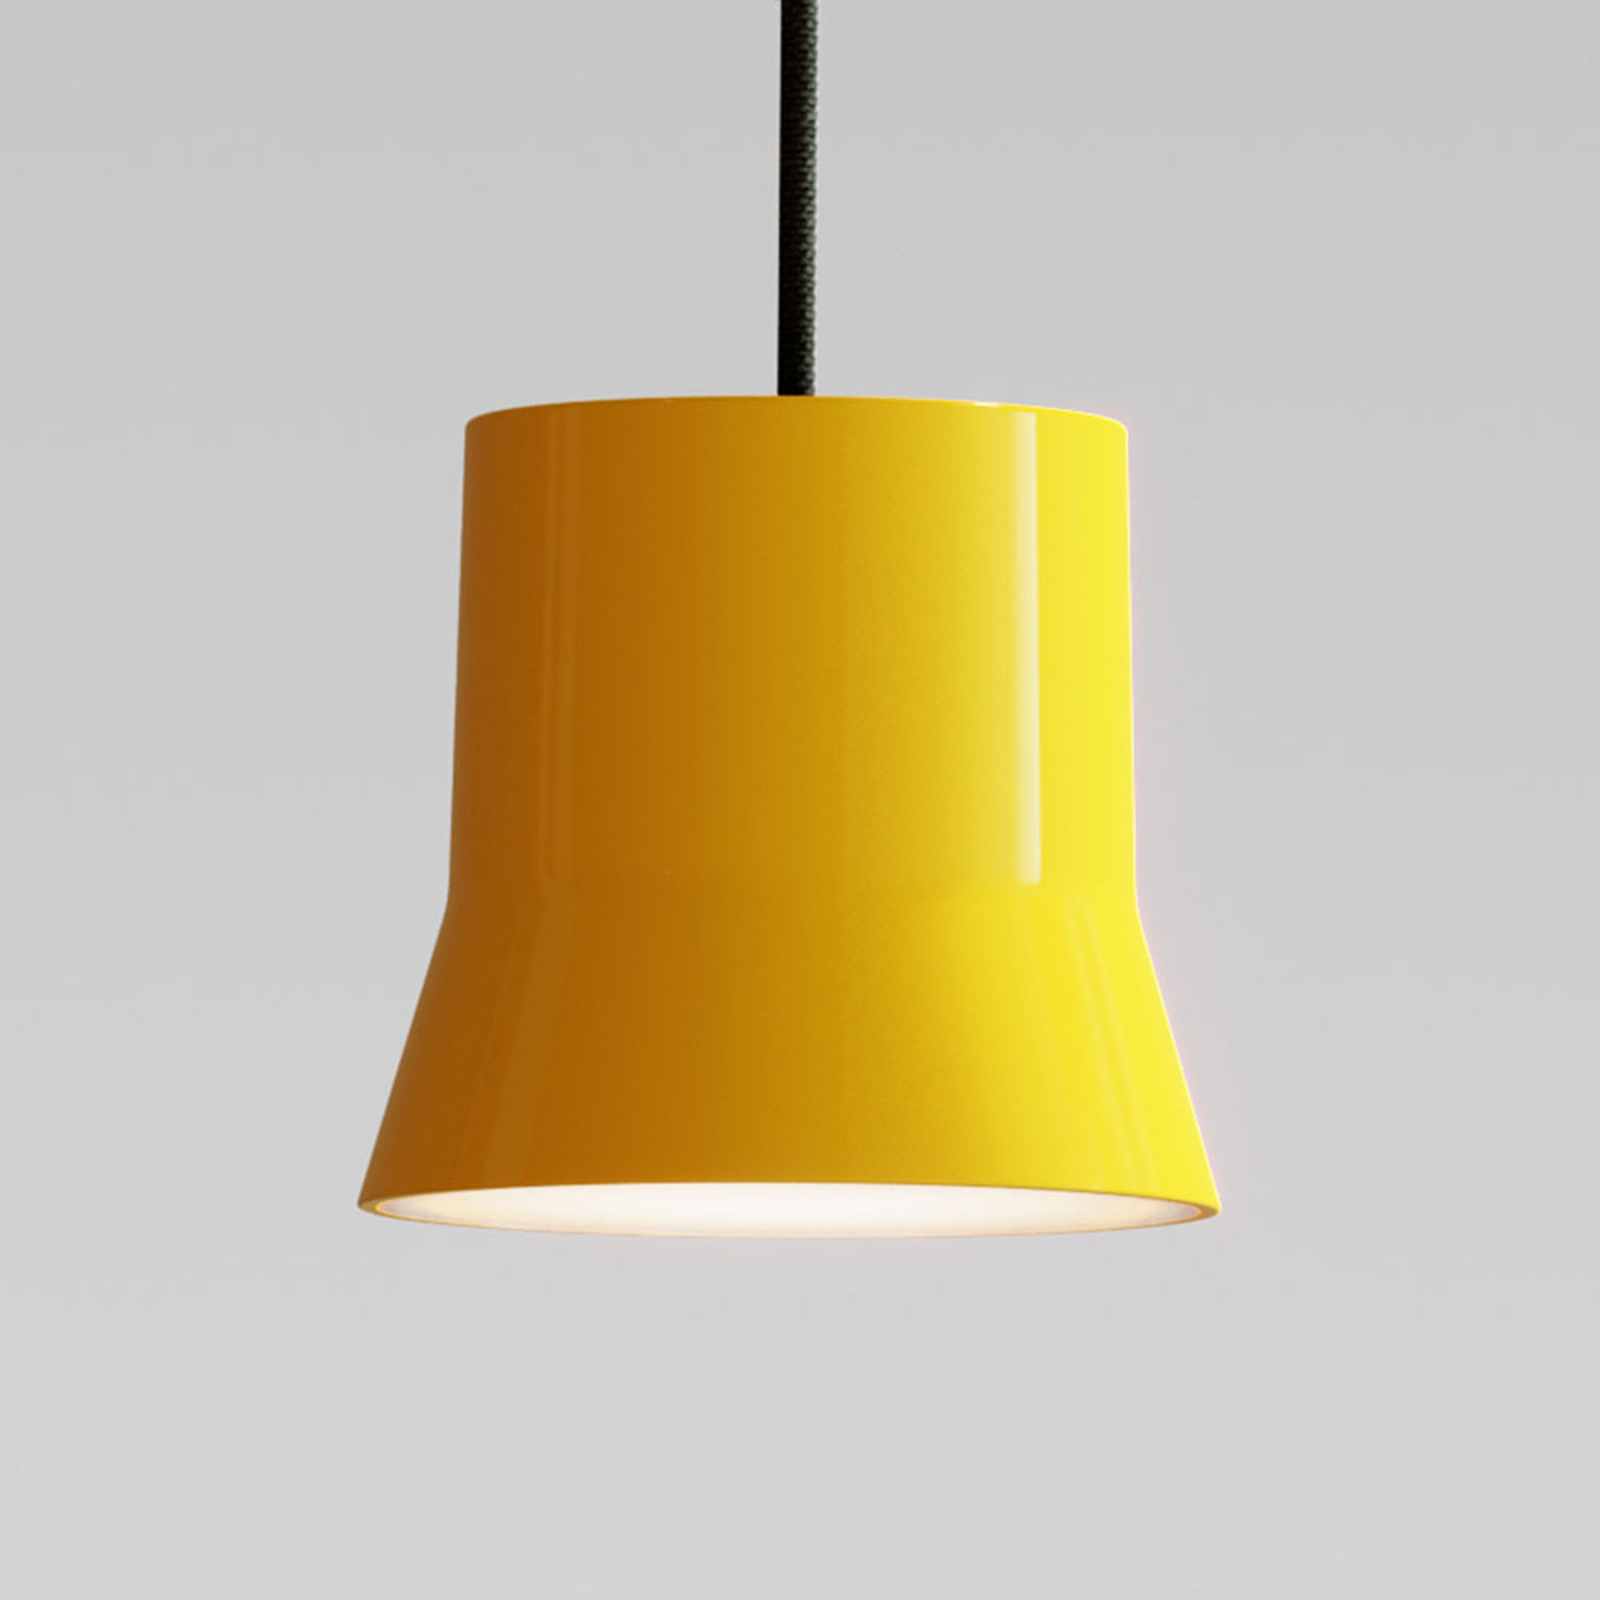 Artemide GIO.light LED-Hängeleuchte, gelb